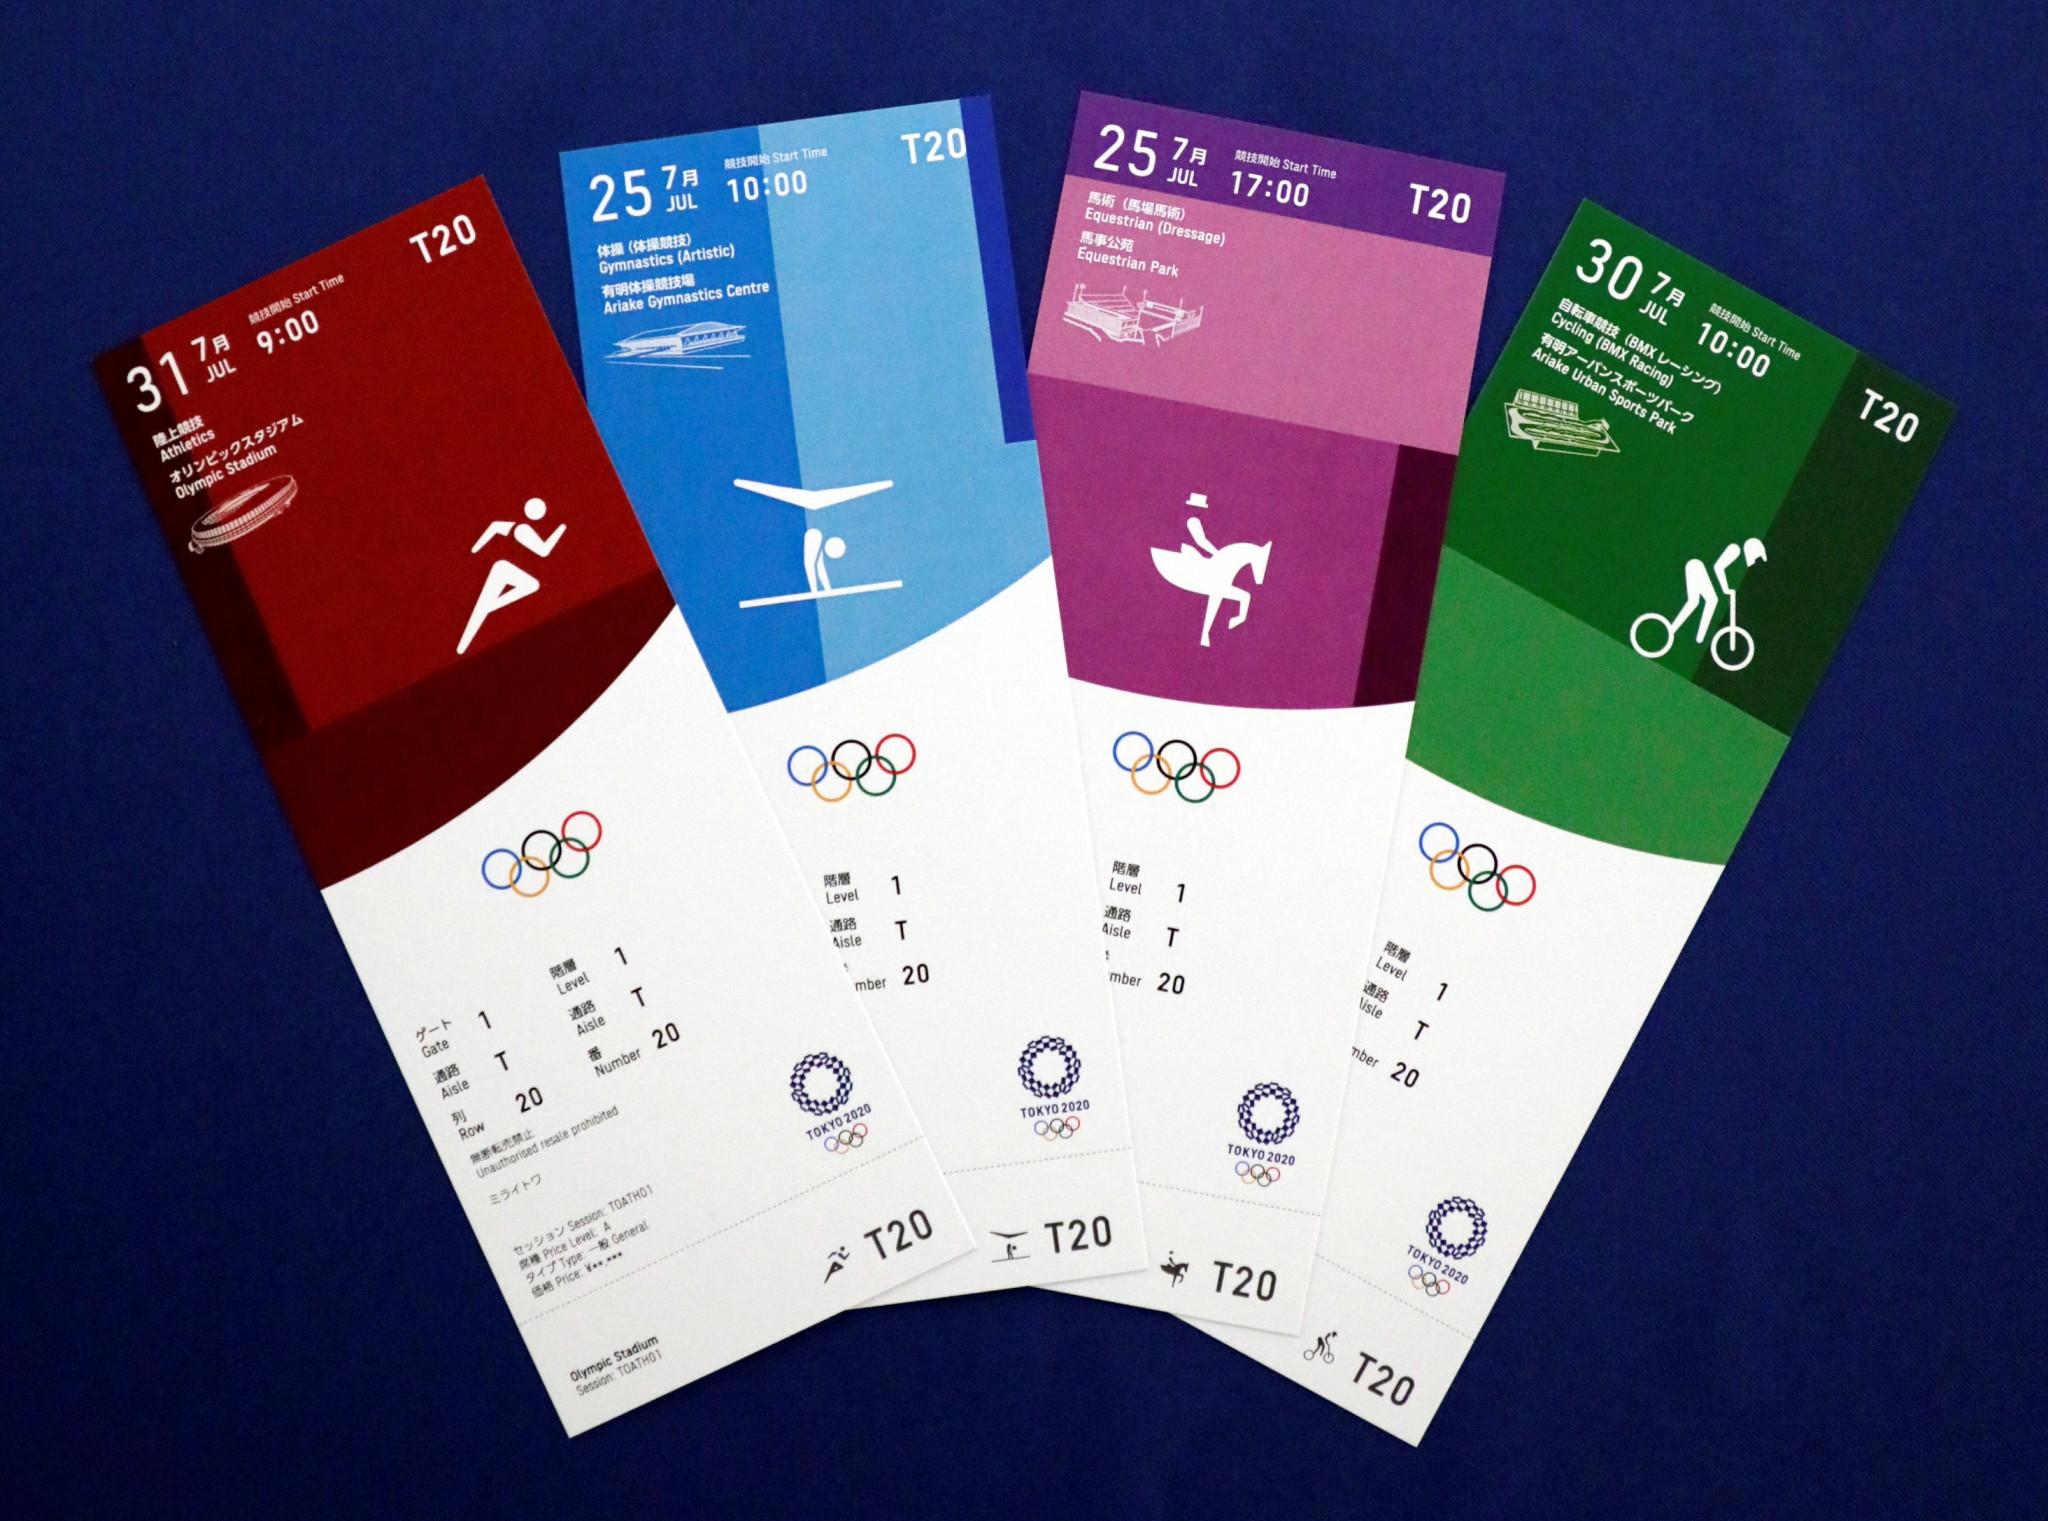 Around 4.48 million tickets were sold for the Olympic Games, while 970,000 were sold for the Paralympics ©Tokyo 2020